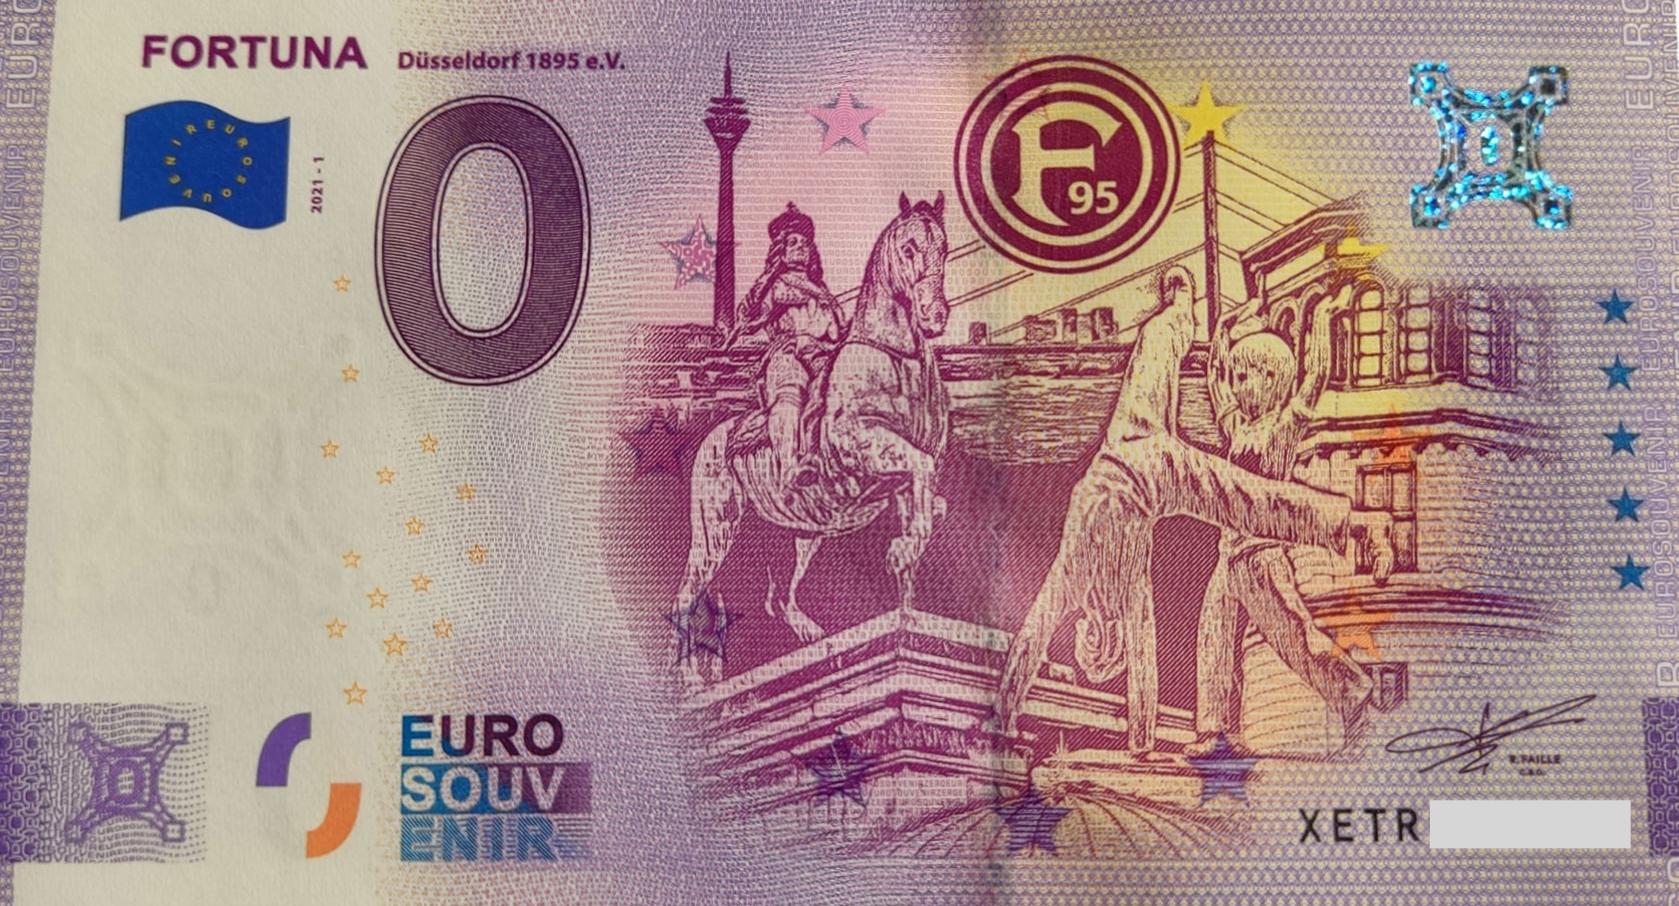 12755_Null_Euro_Vorne_99_1_I2.jpg